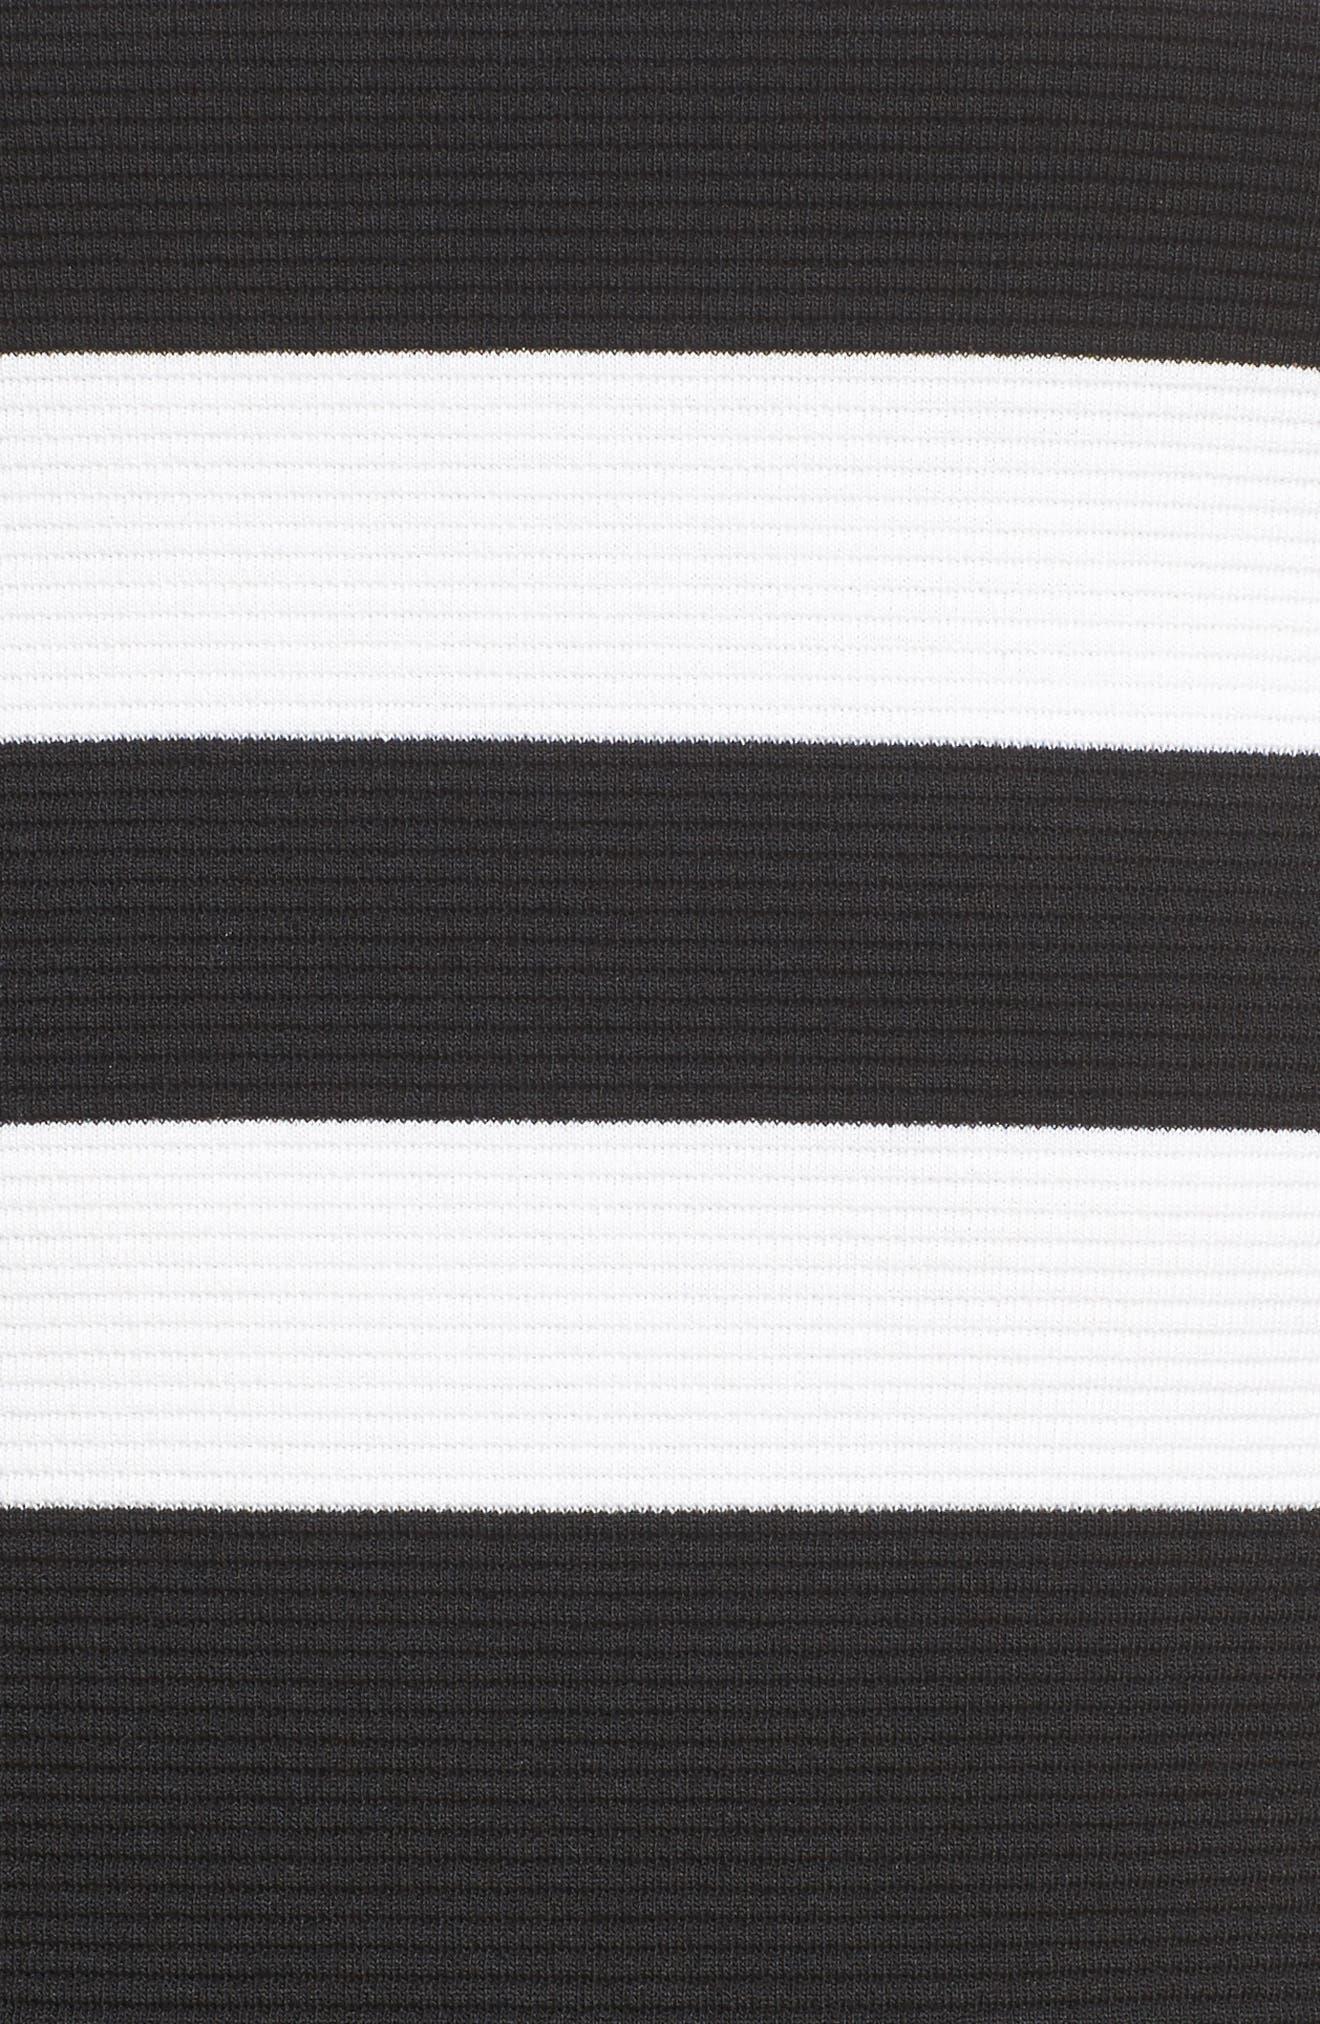 Stripe Ottoman Sheath Dress,                             Alternate thumbnail 5, color,                             Black/ White